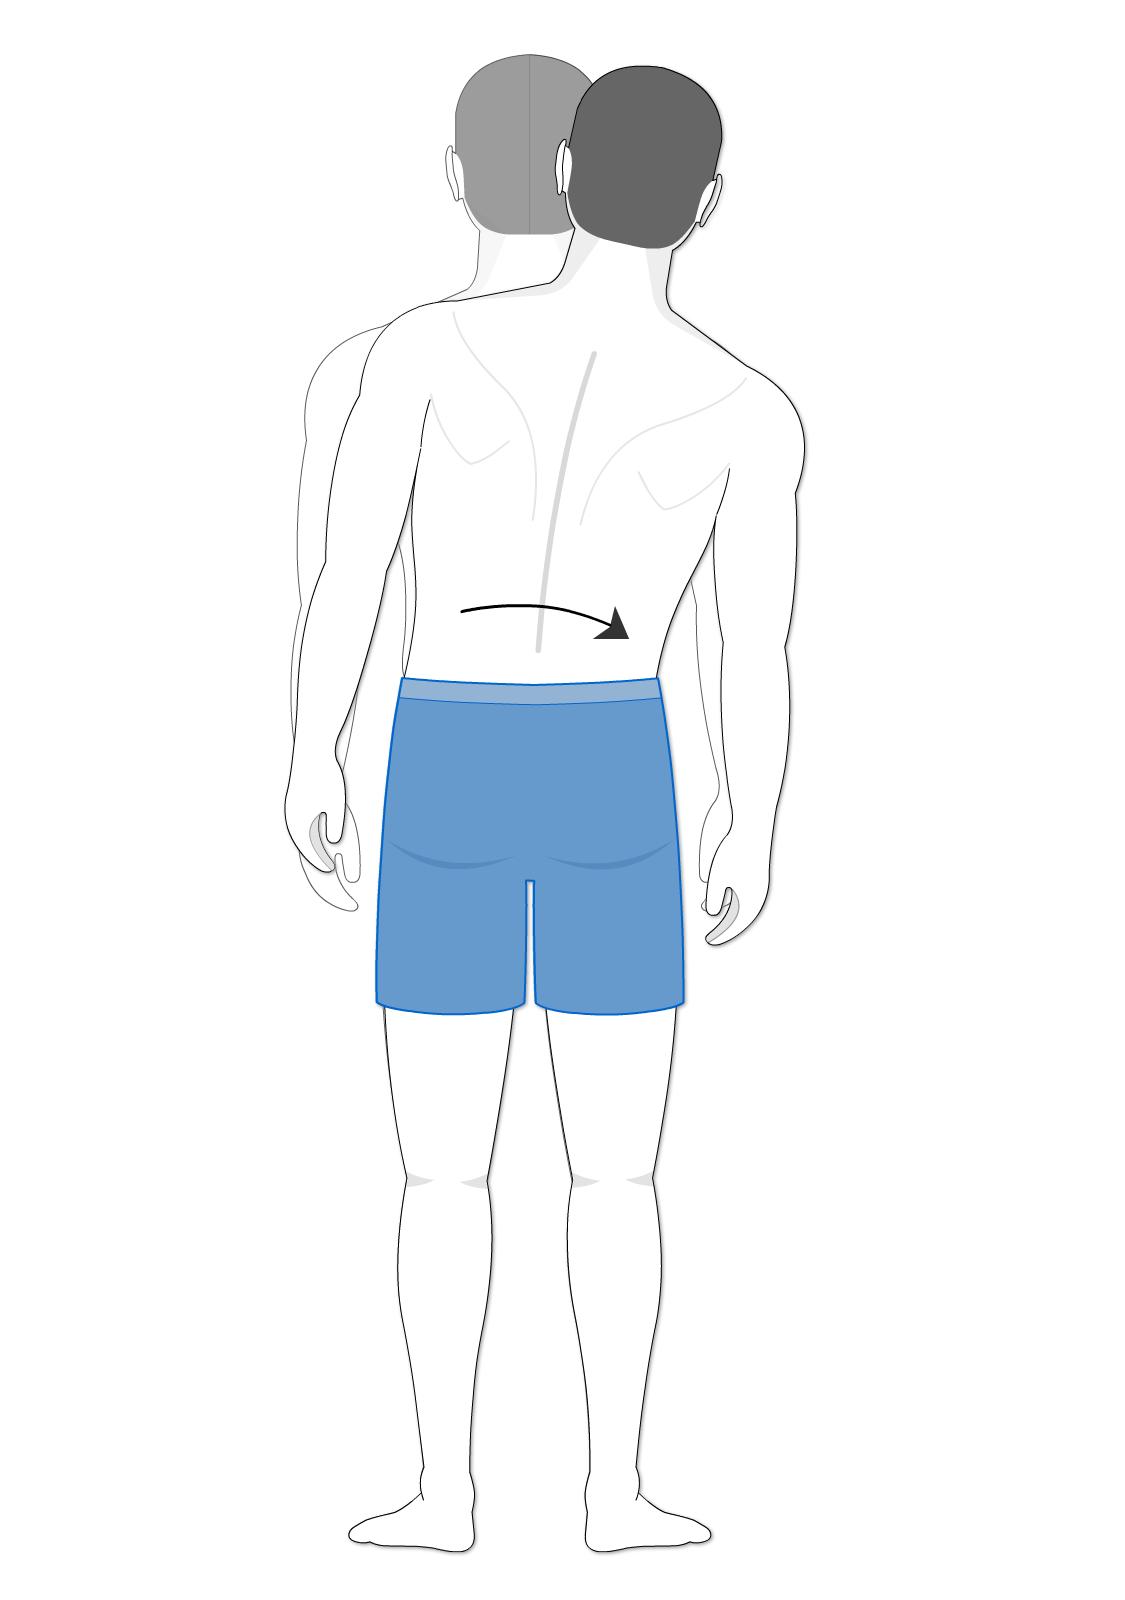 Lateral flexion of the vertebral column